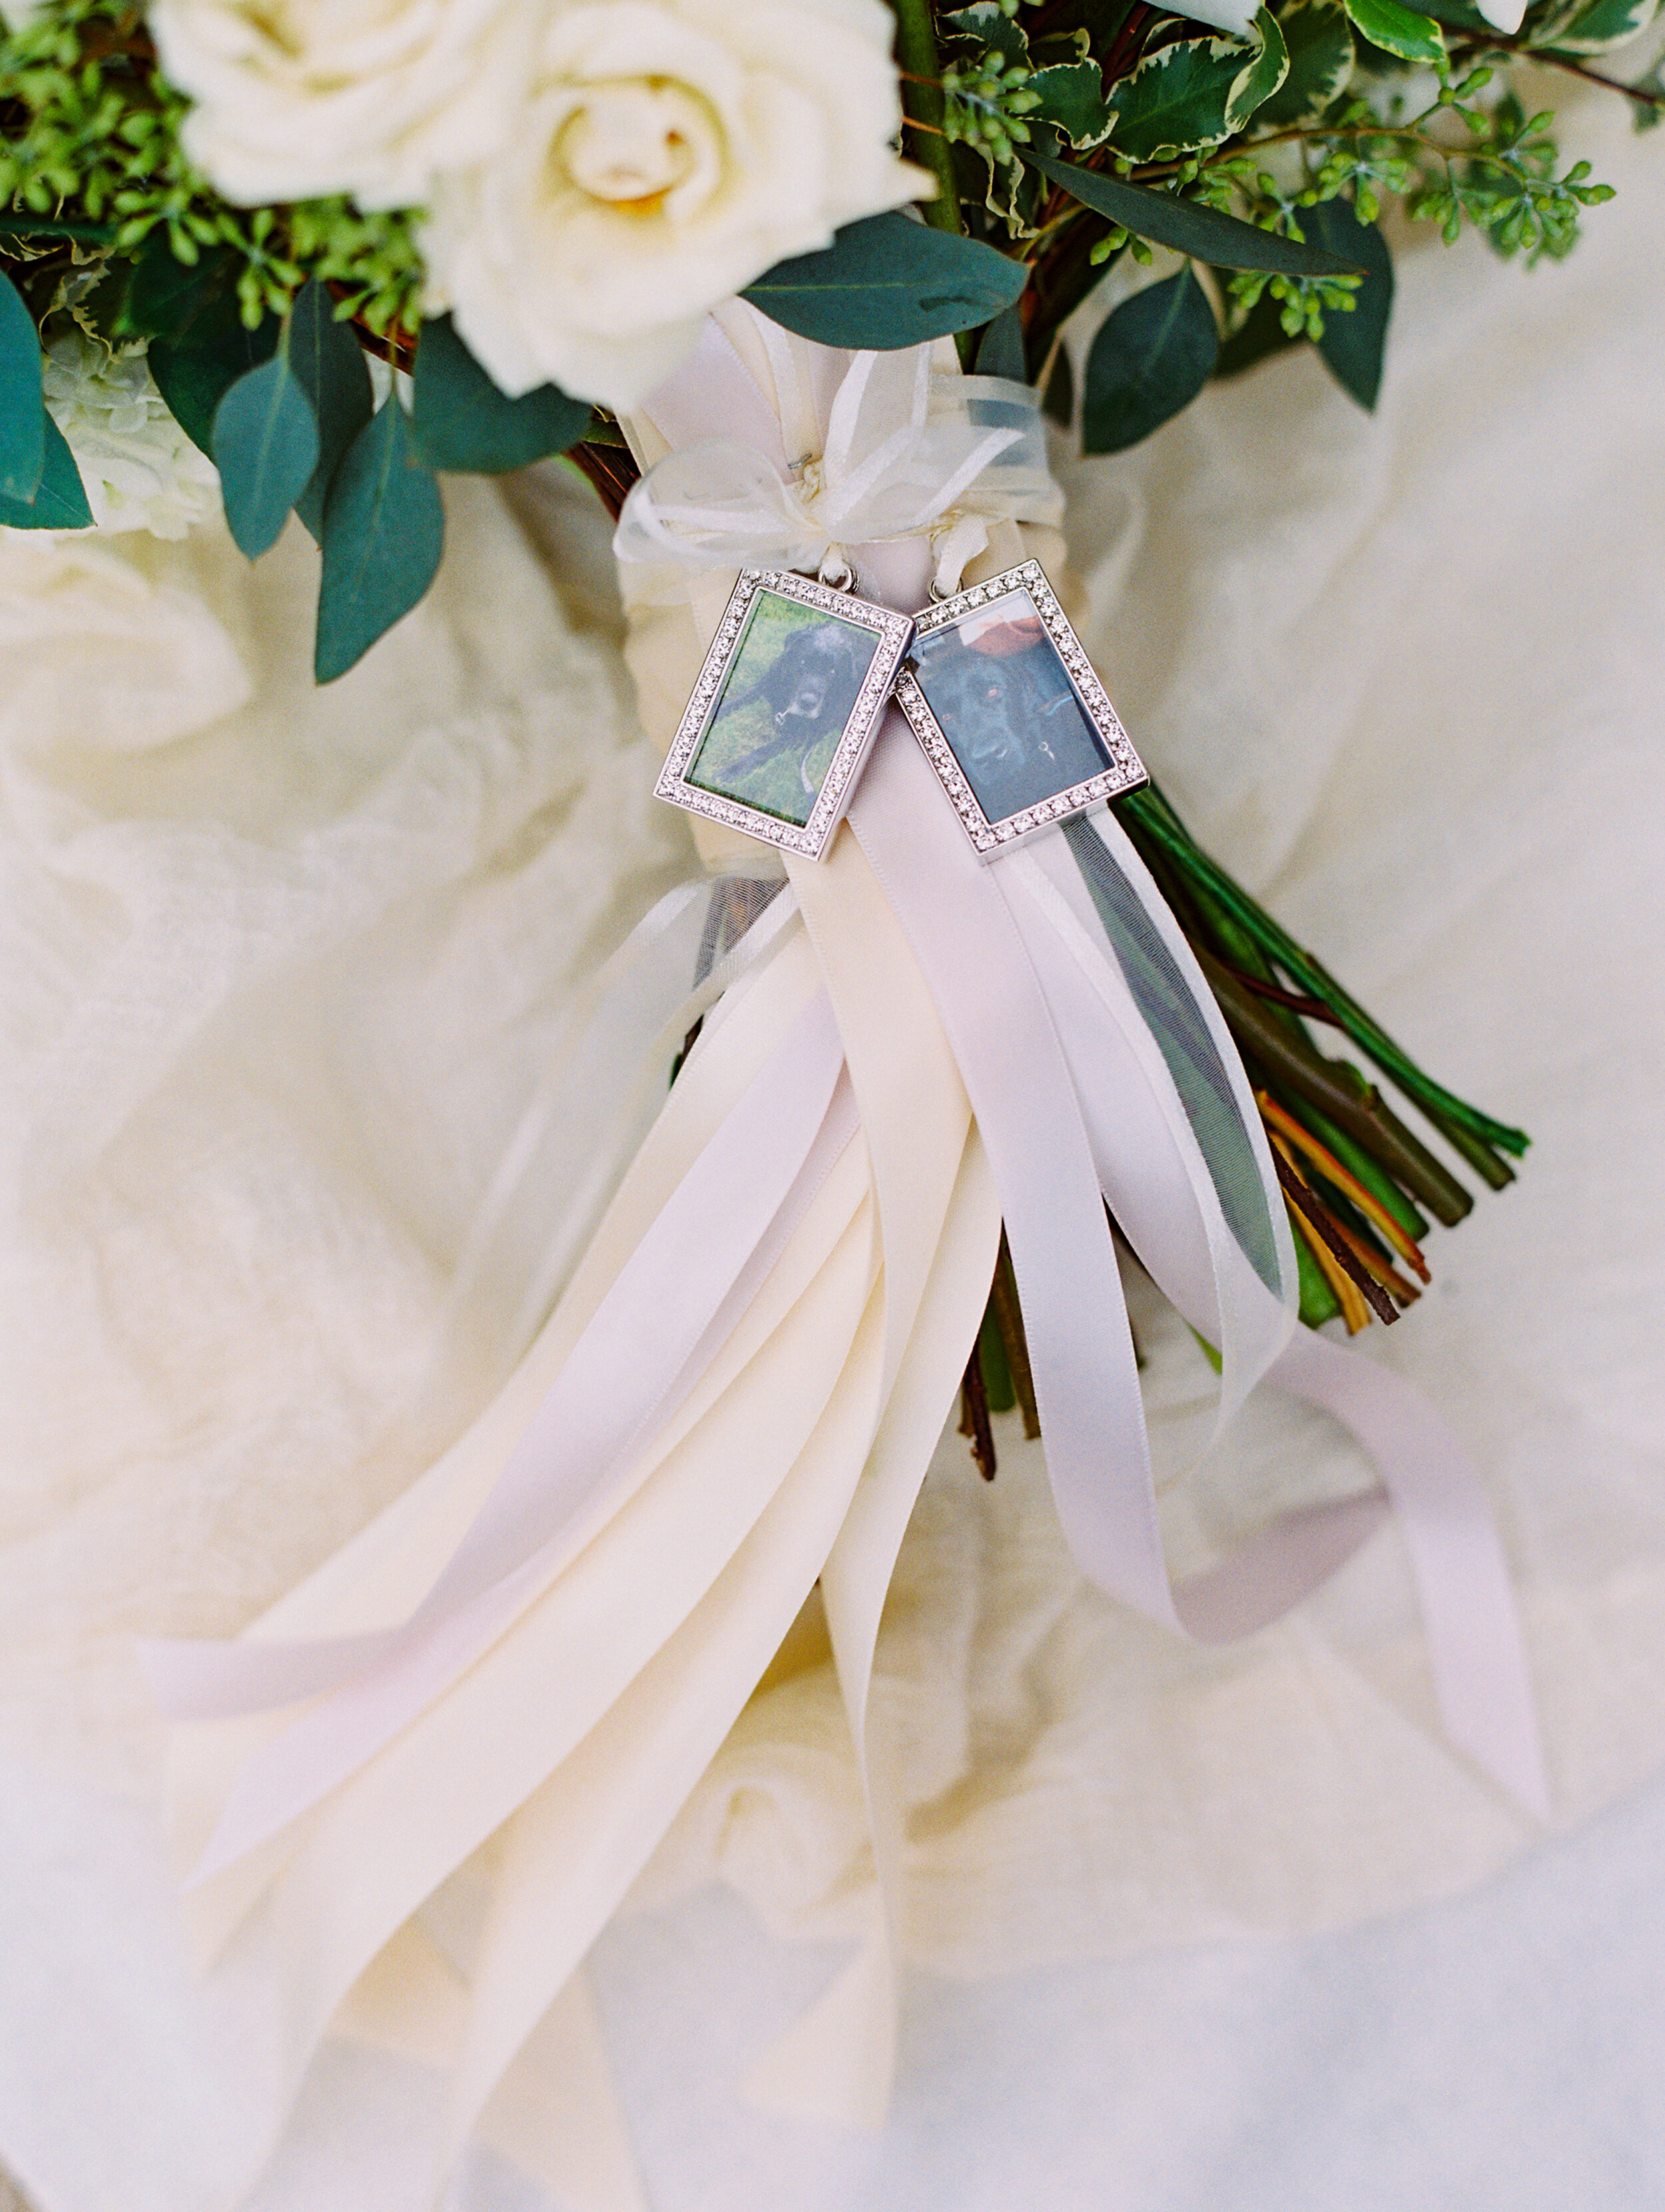 Kuiper+Wedding+Details-59.jpg